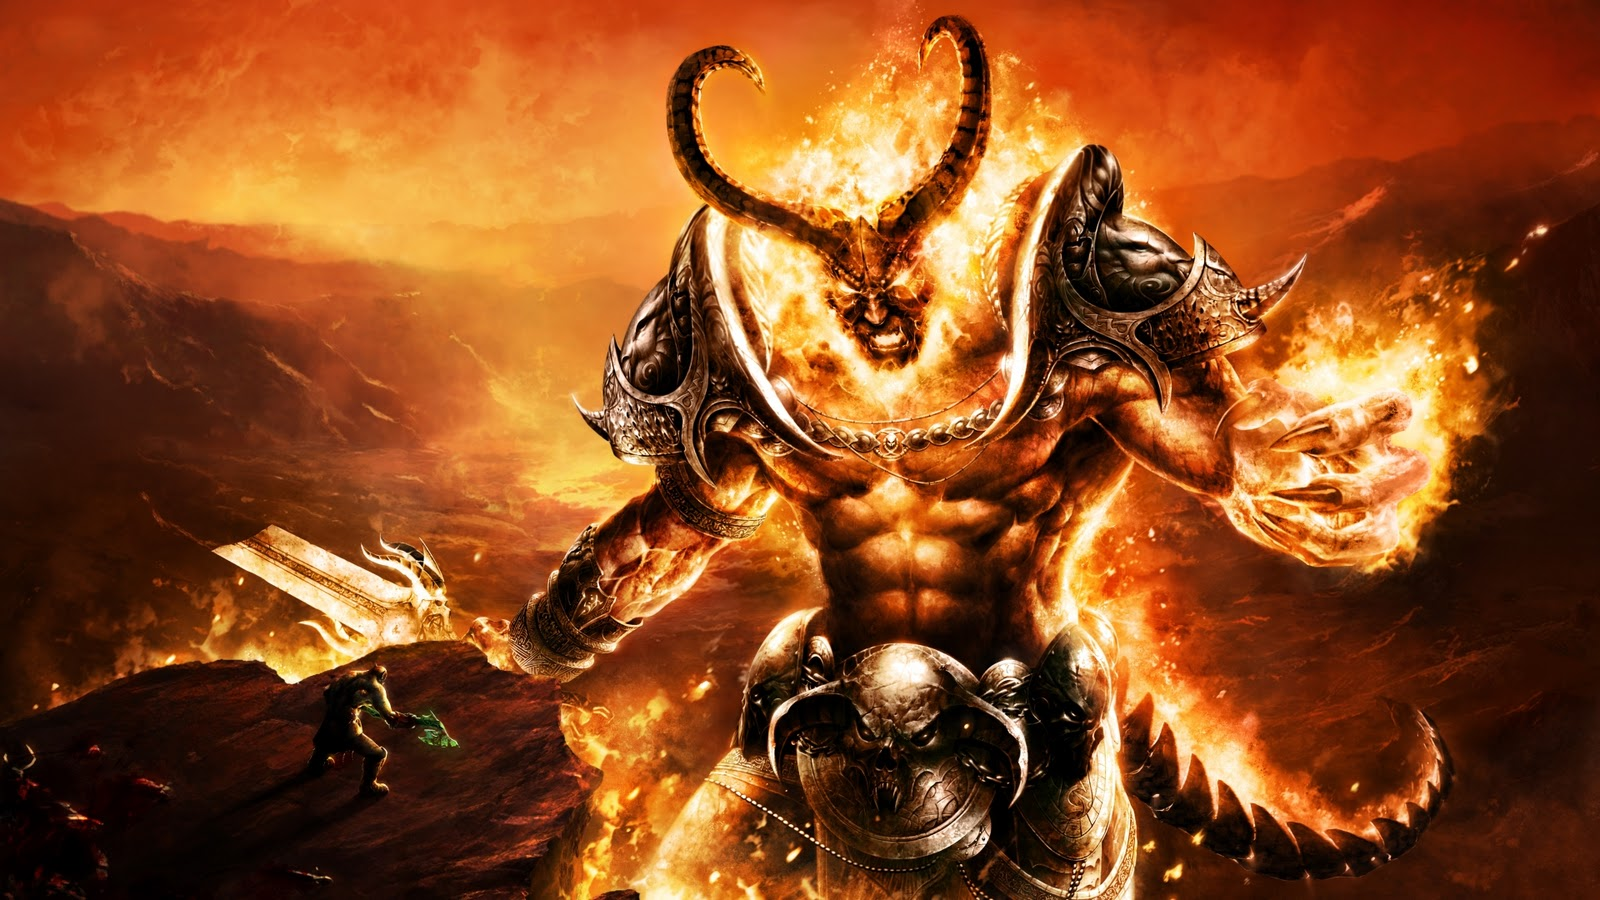 devil demon wallpaper - photo #35